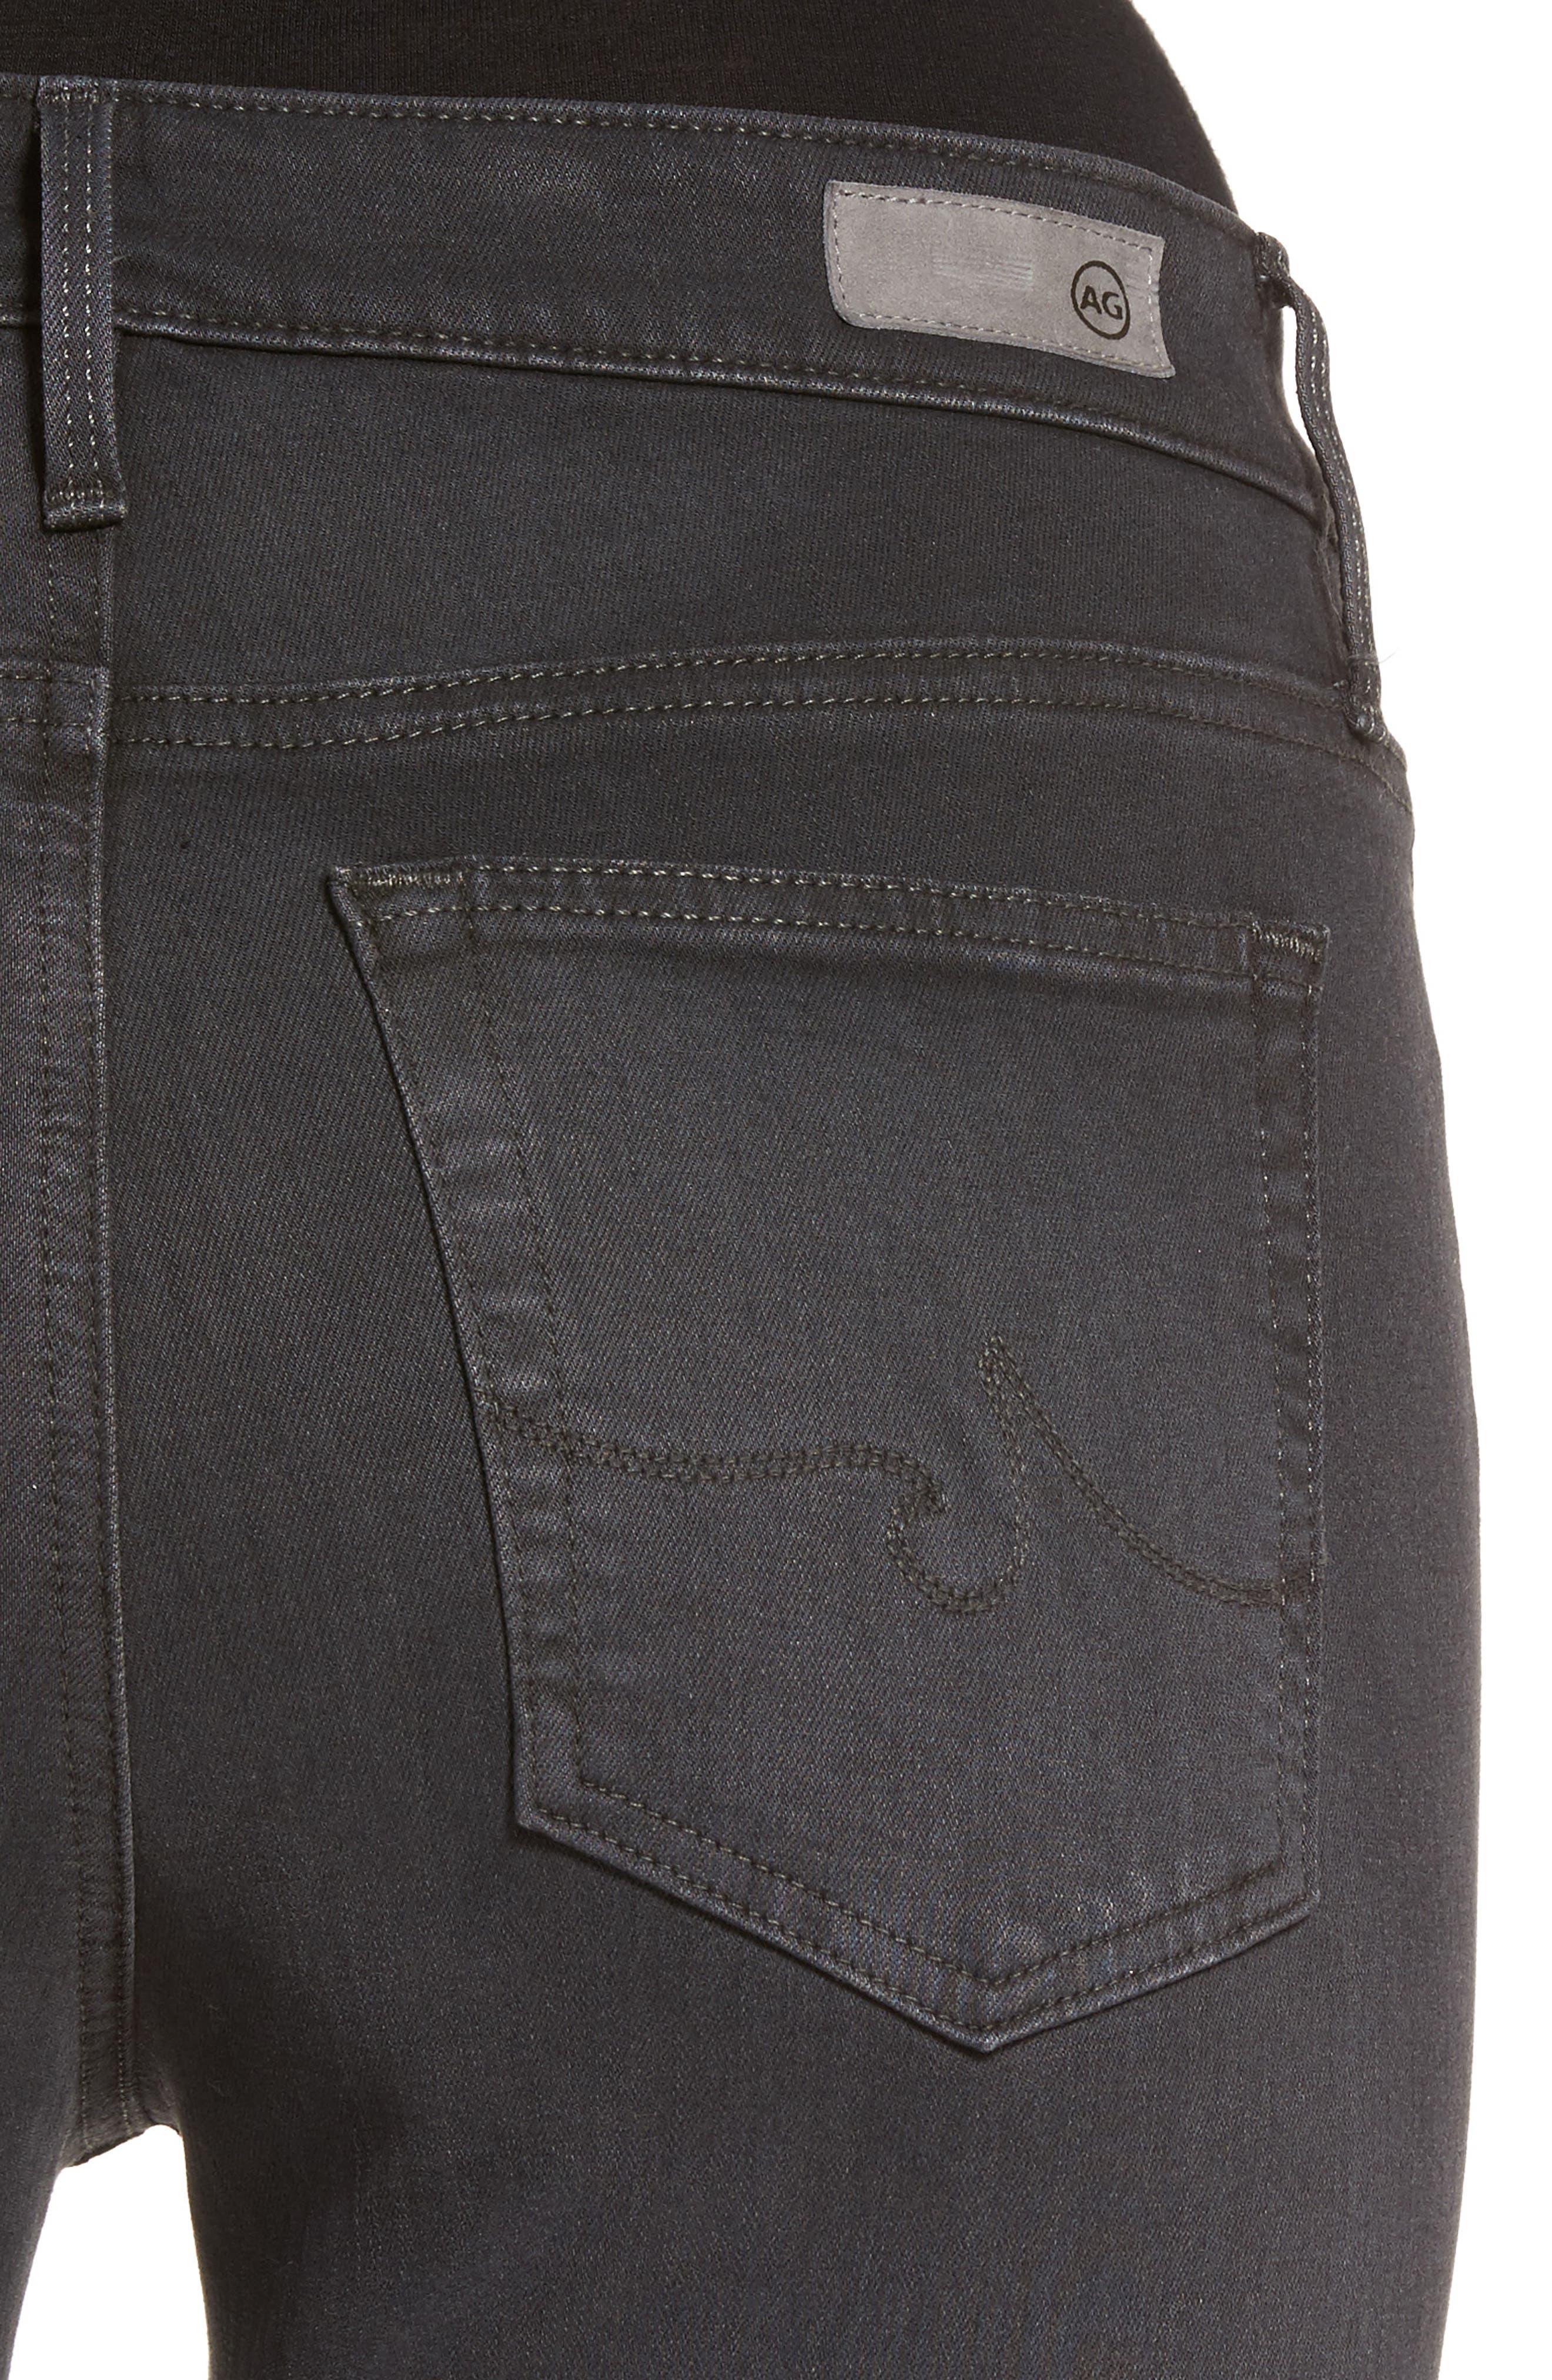 Farrah High Waist Ankle Skinny Jeans,                             Alternate thumbnail 9, color,